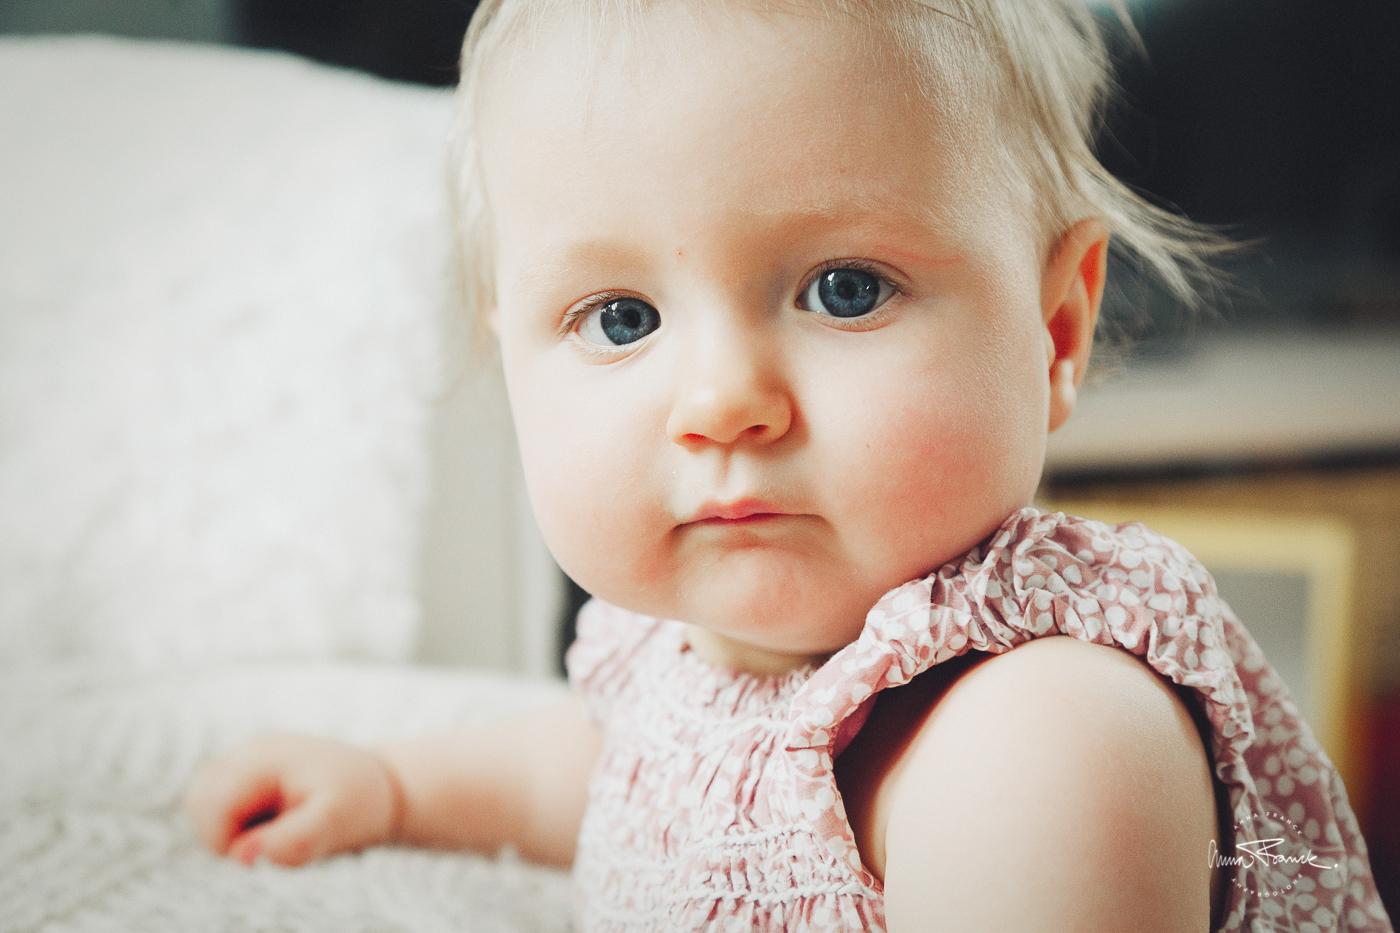 barnfotografering, lapsikuvaus, kids, photography, anna, franck, pargas, parainen, finland, suomi, natural, luonnollinen, retro, bohemiskt